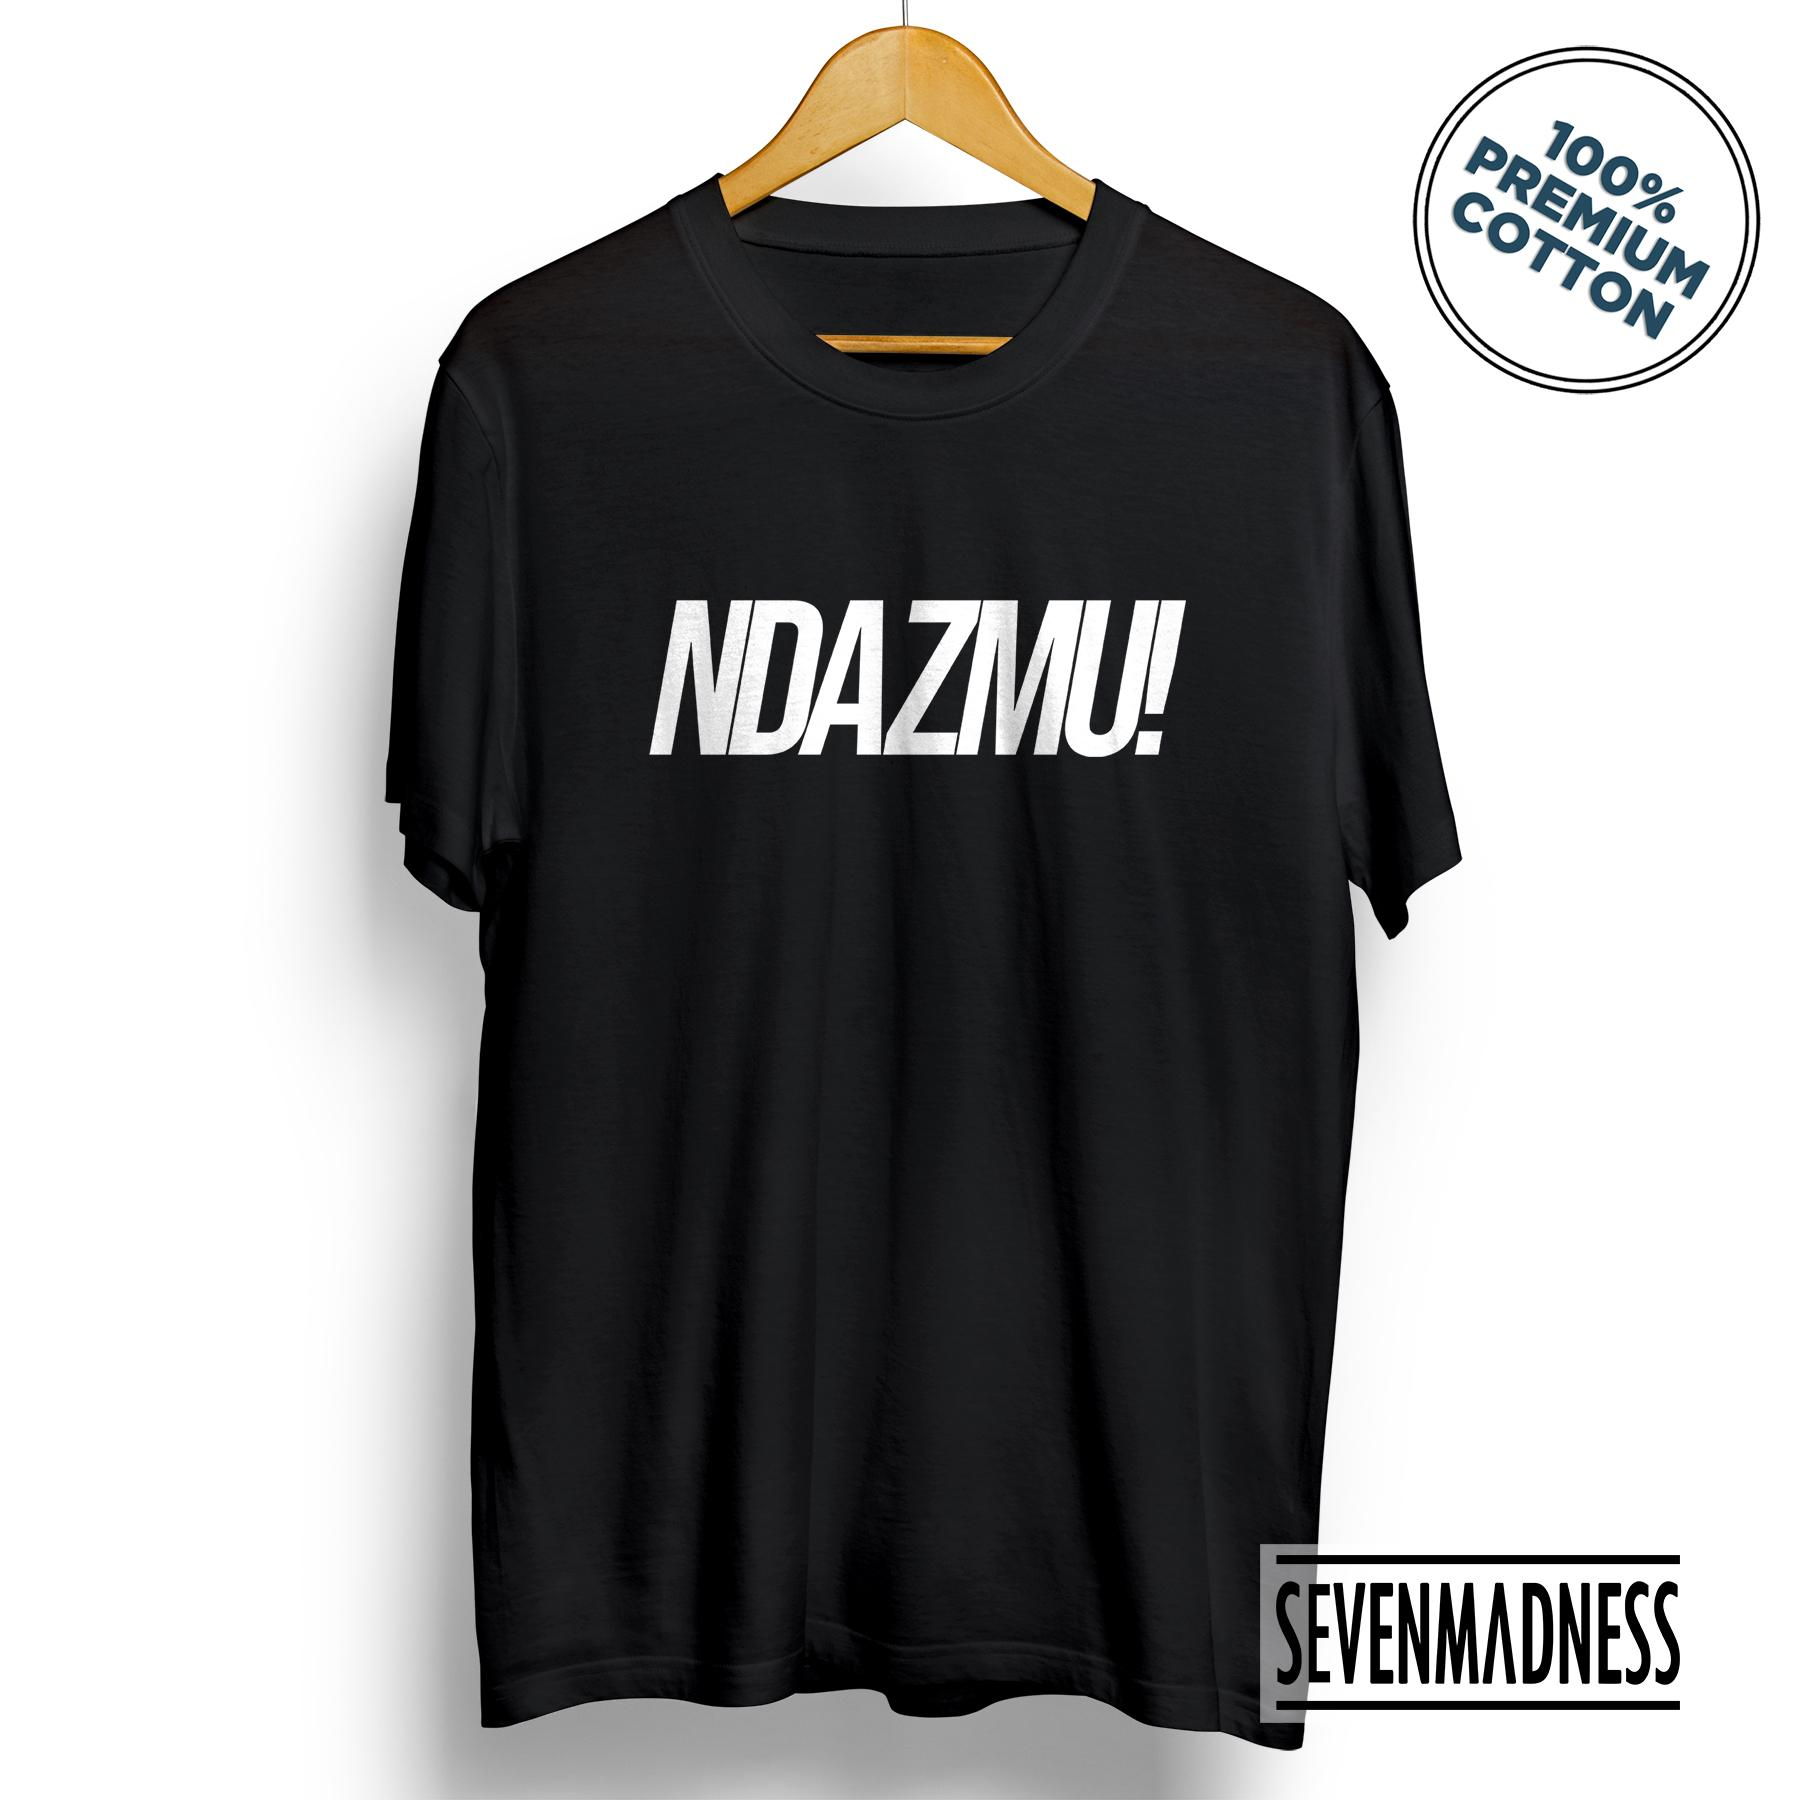 Sevenmadness - Kaos T-shirt Distro Tshirt Pria   Wanita - Ndazmu! Ndasmu a04d289031